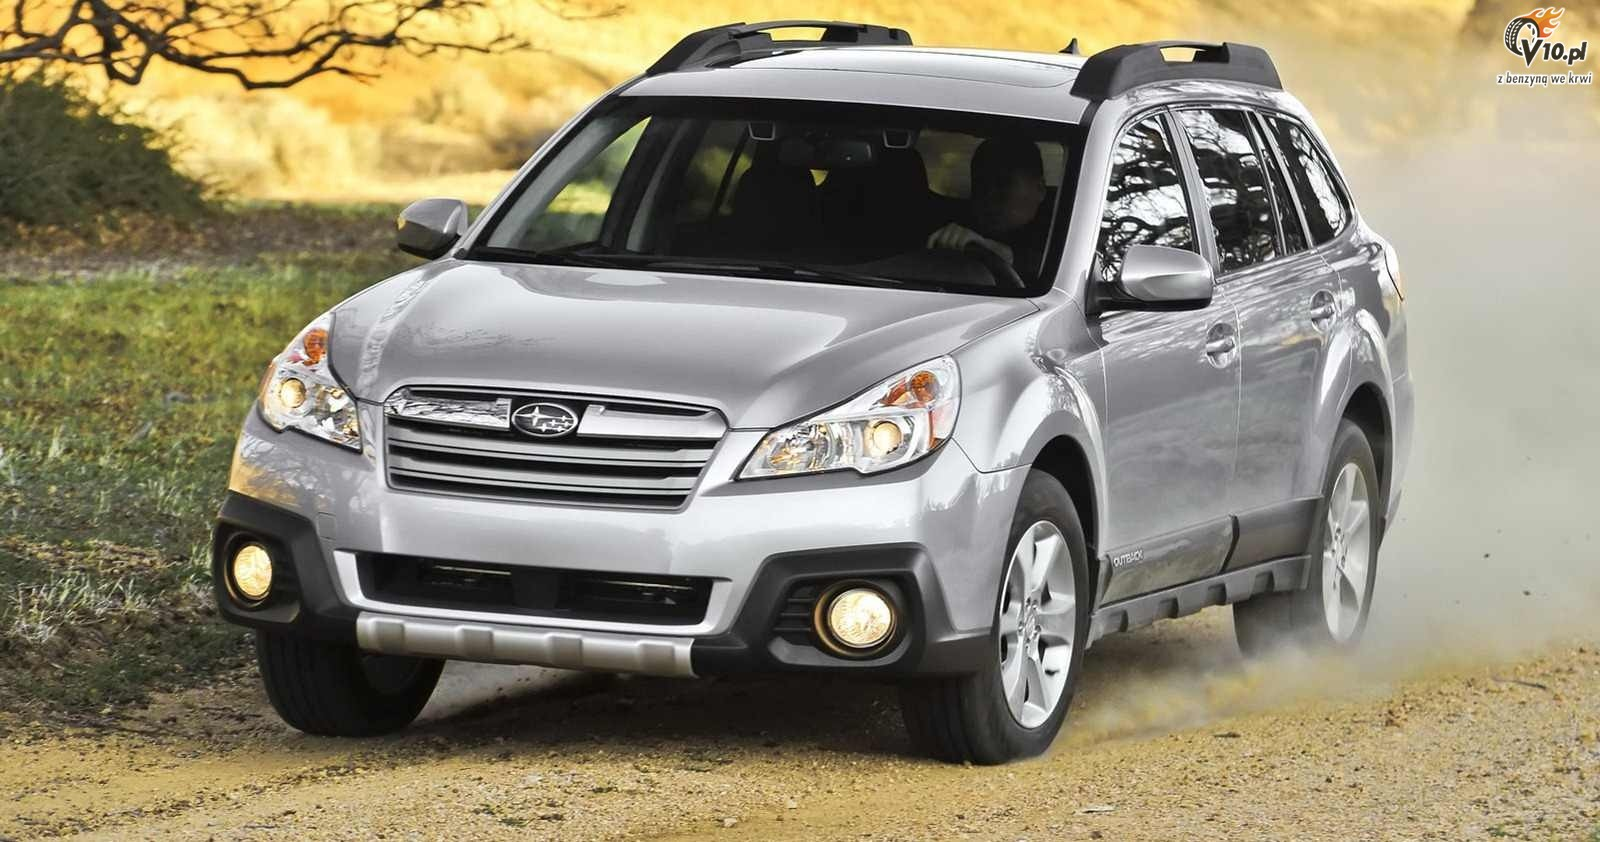 Pics Photos - Subaru Face Lifting Subaru Outback Facelift